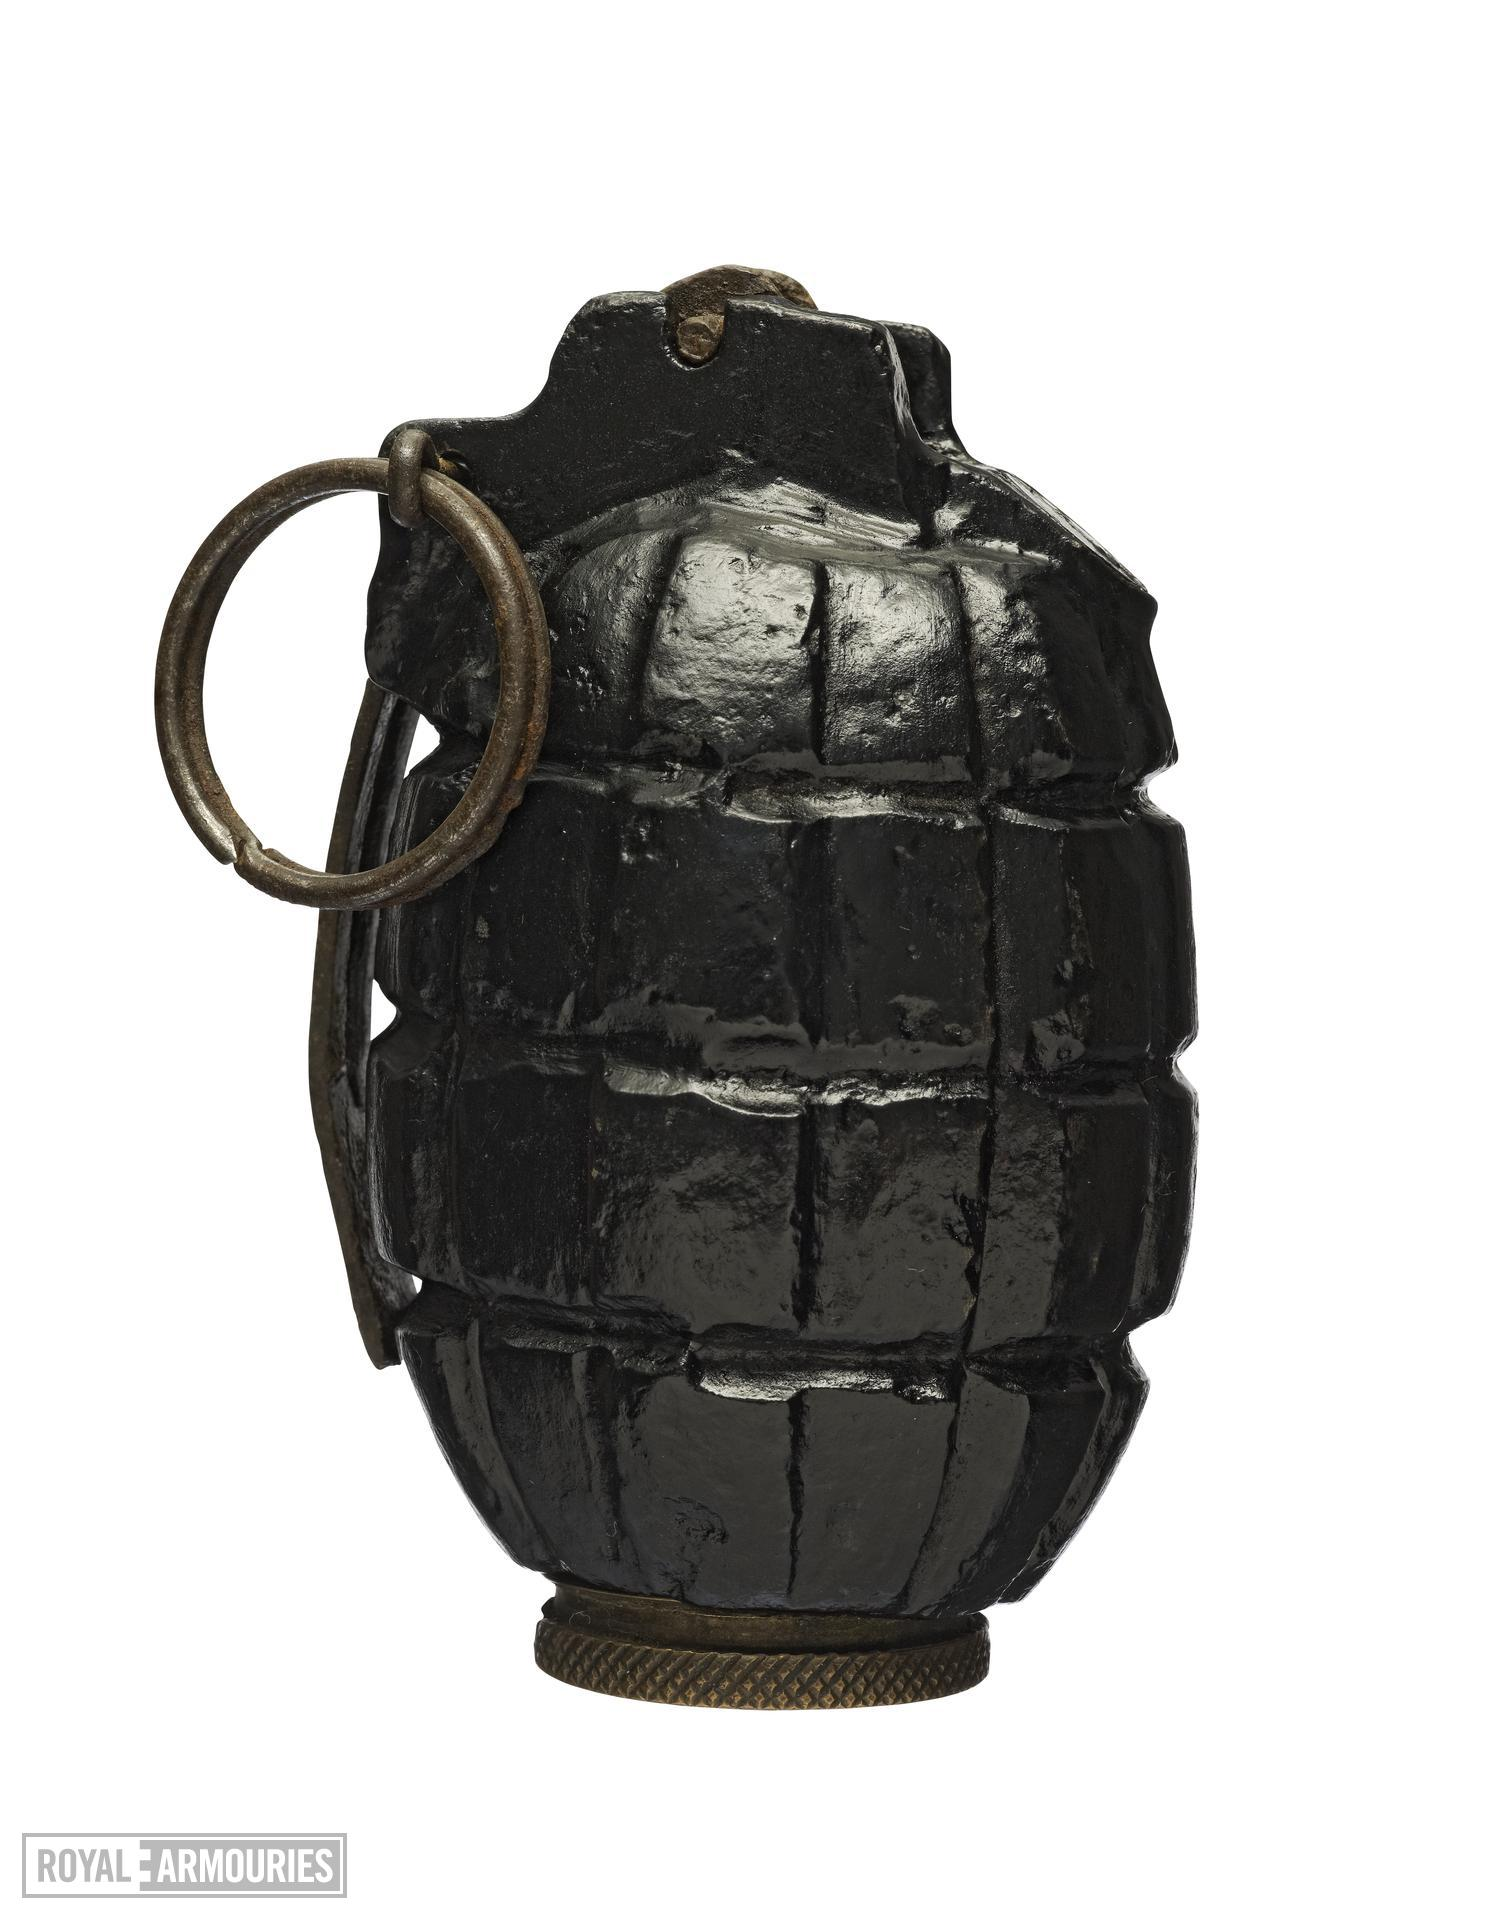 Grenade - Number 5 'Mills' hand grenade